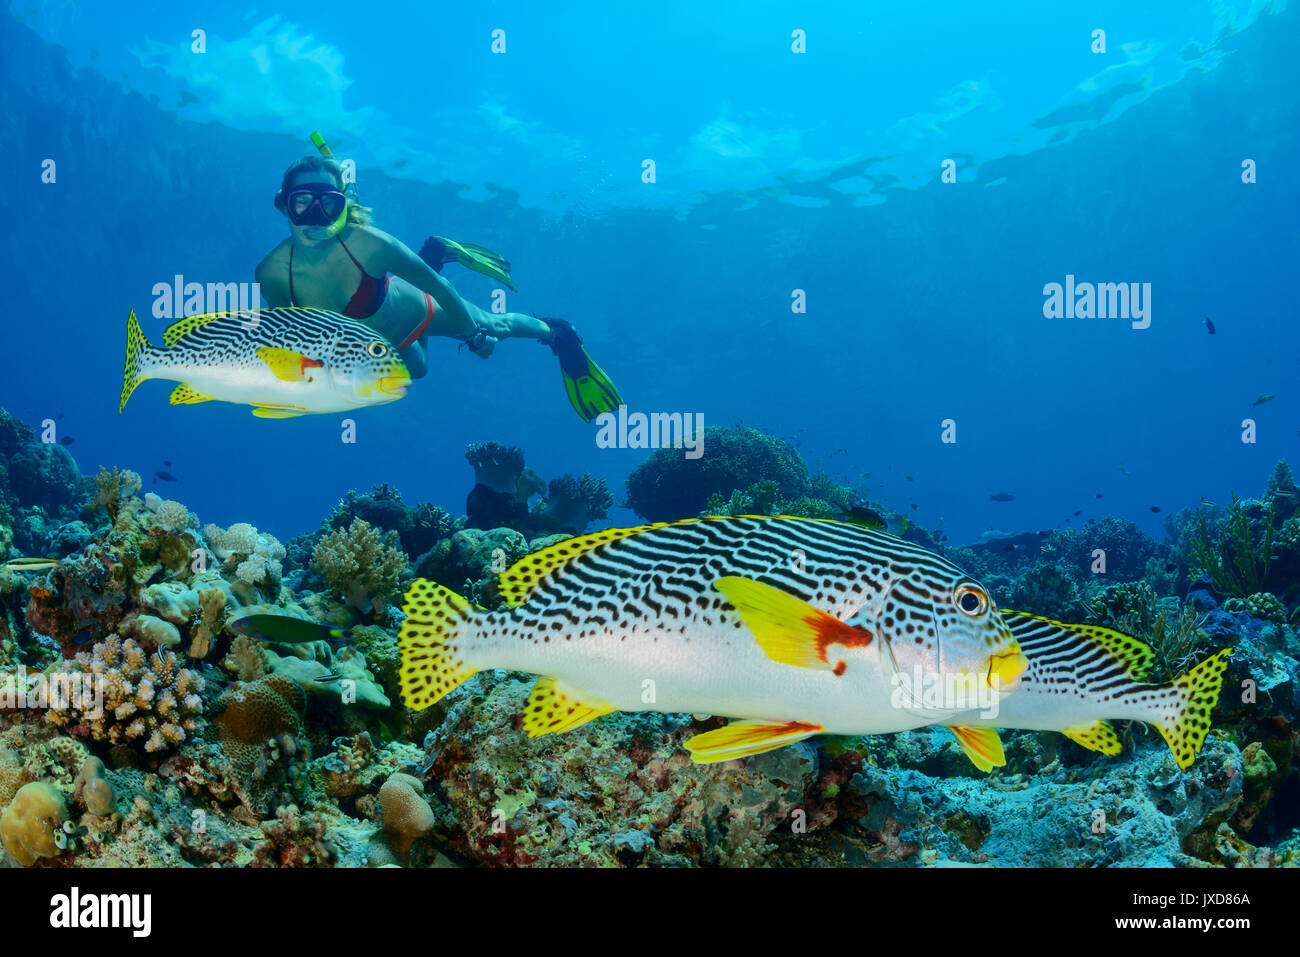 Young woman snorkeling with Yellowbanded sweetlipps, Selayar Island, Indonesia, Indian Ocean - Stock Image